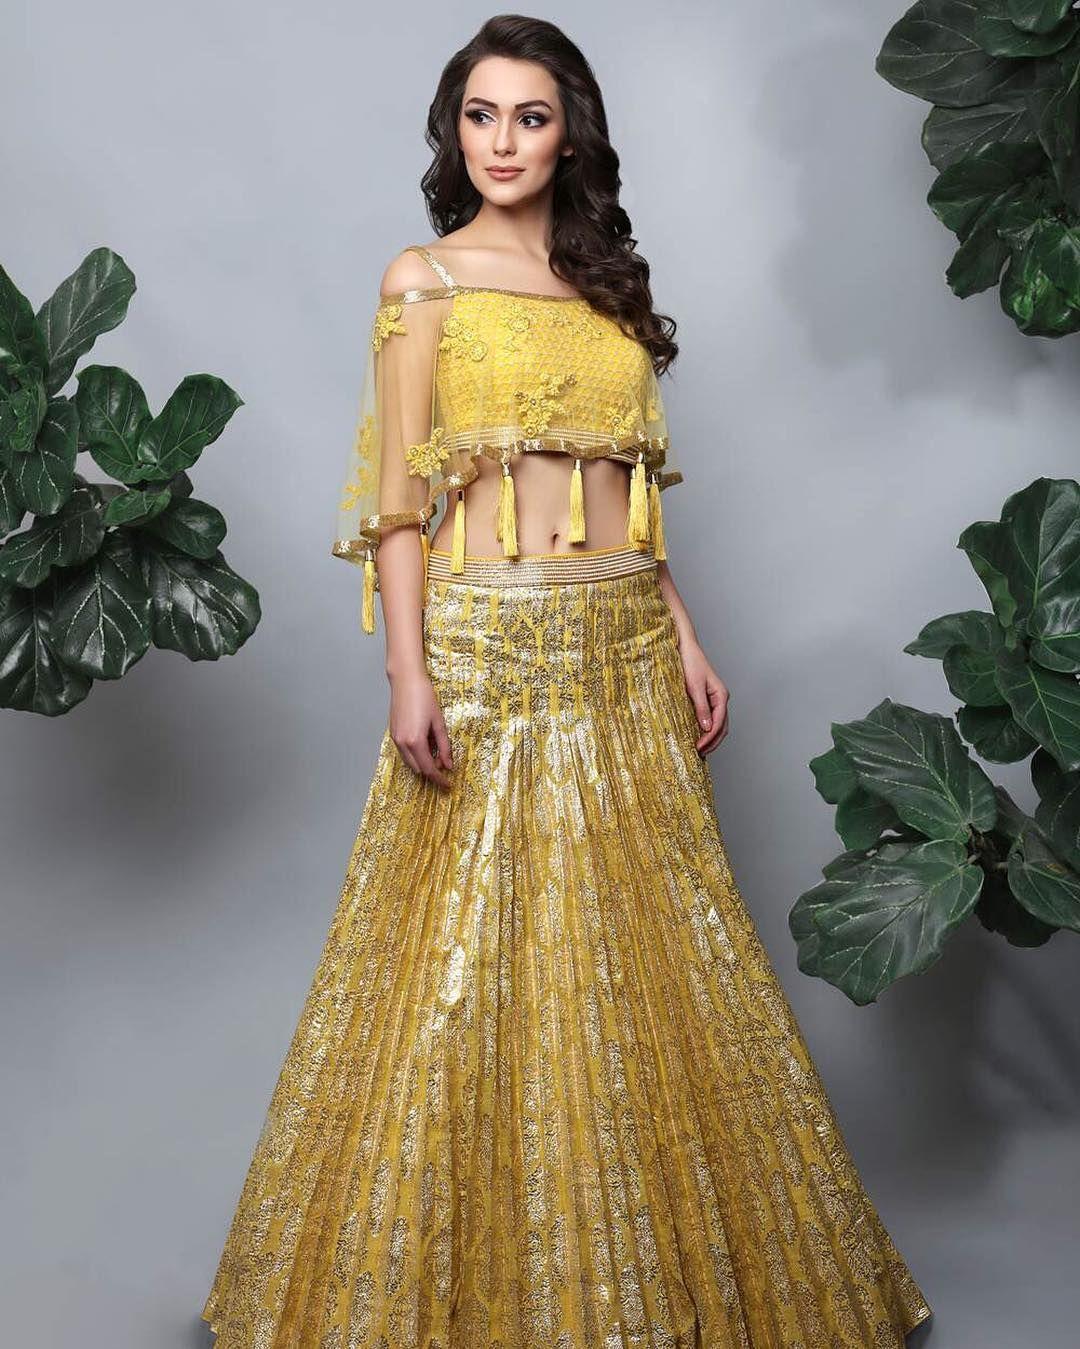 b79b650b31 10 Pretty Yellow Lehengas For Your Haldi Outfit Inspiration [2019 ...